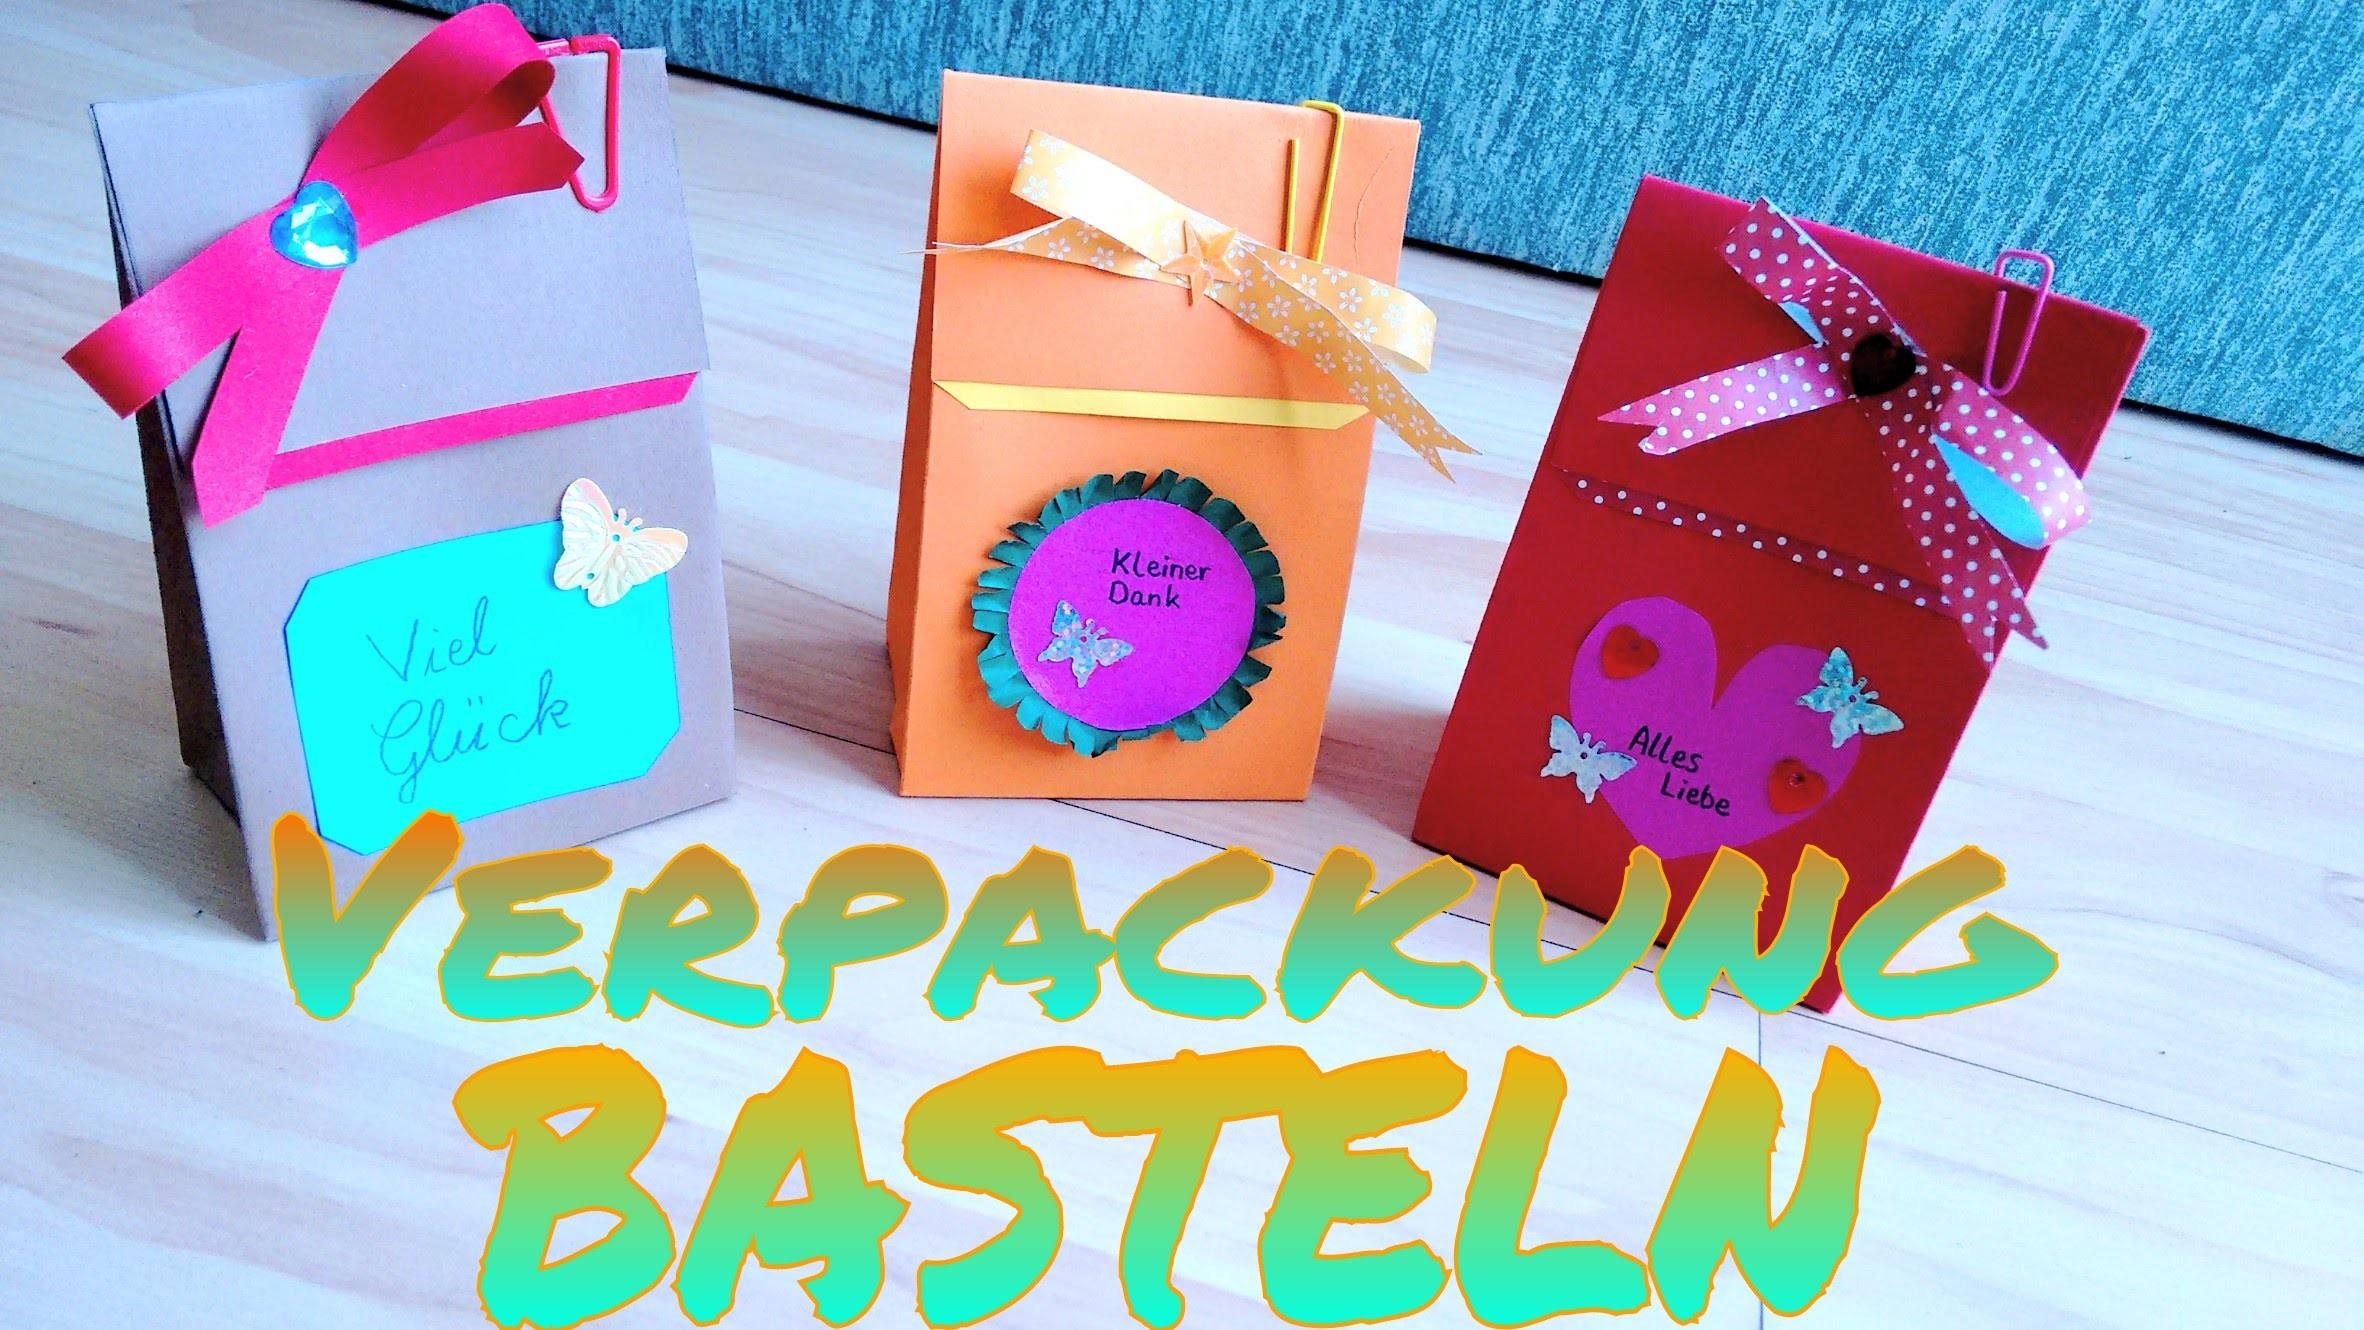 DIY - Verpackung selber basteln (Deutsch)